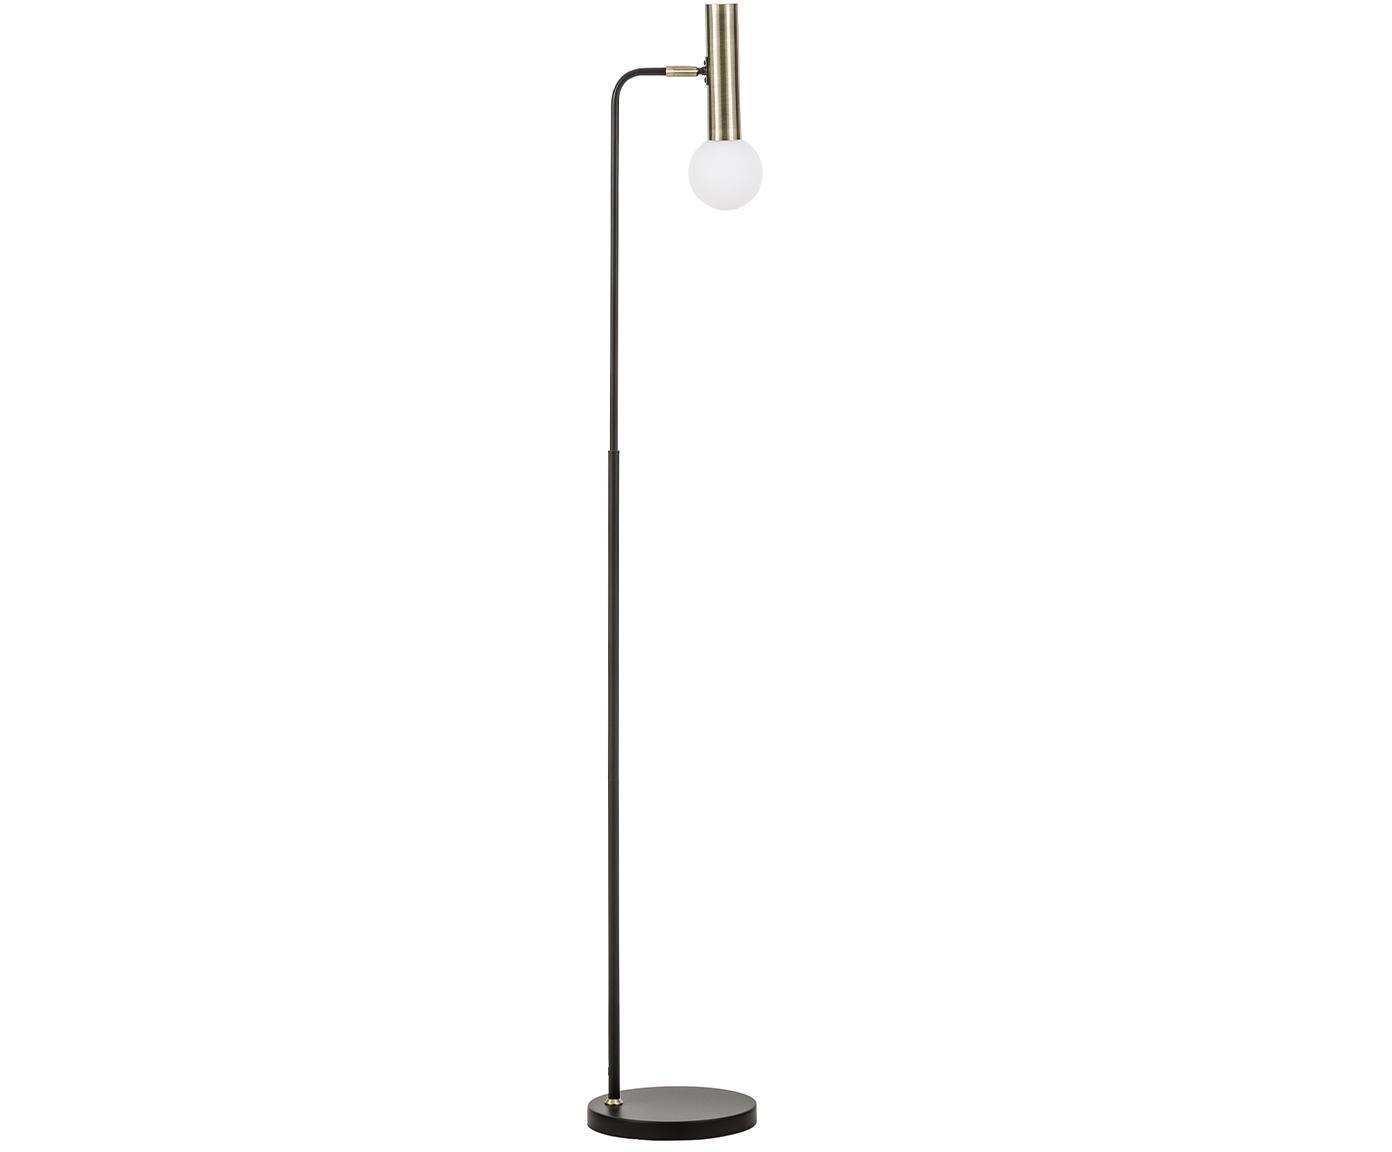 Lámpara de pie LEDWilson, Pantalla: vidrio, Cable: tela, Negro, Ø 23 x Al 153 cm